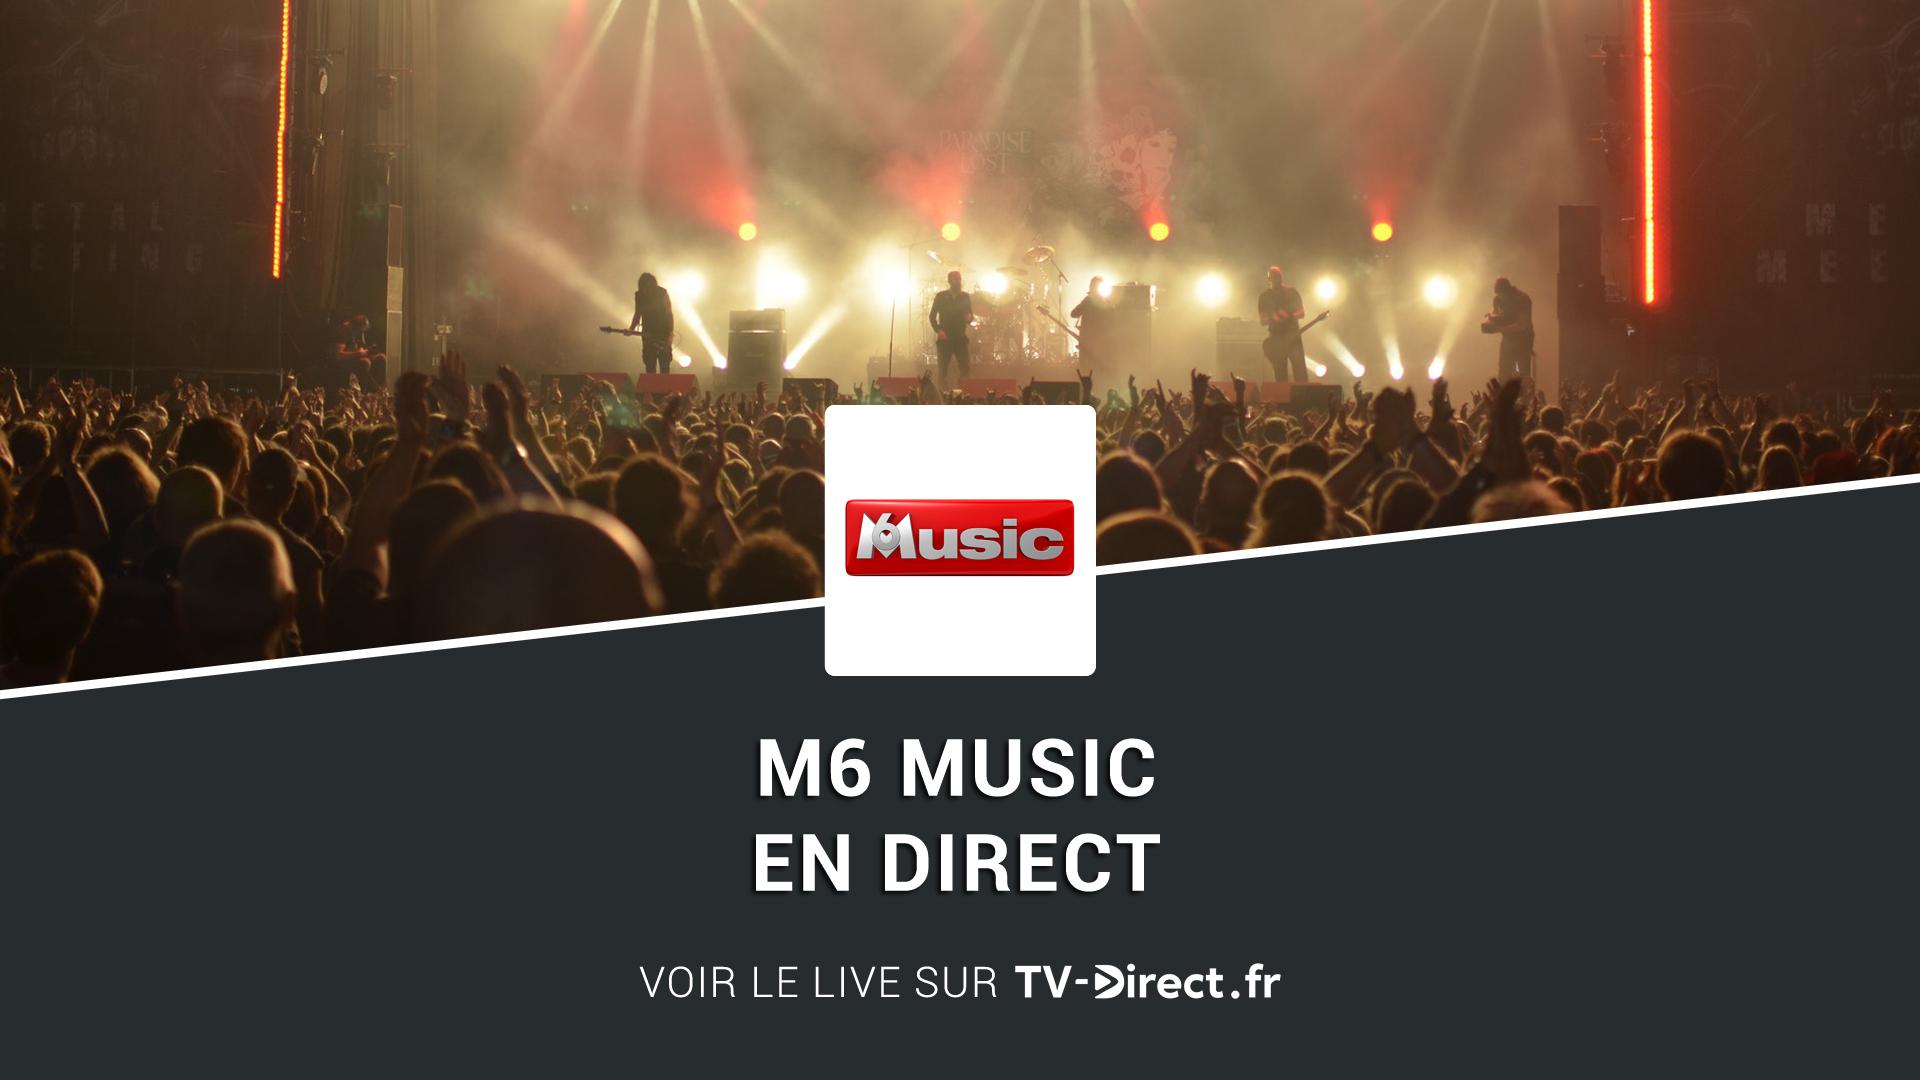 m6 music direct regarder m6 music live sur internet. Black Bedroom Furniture Sets. Home Design Ideas